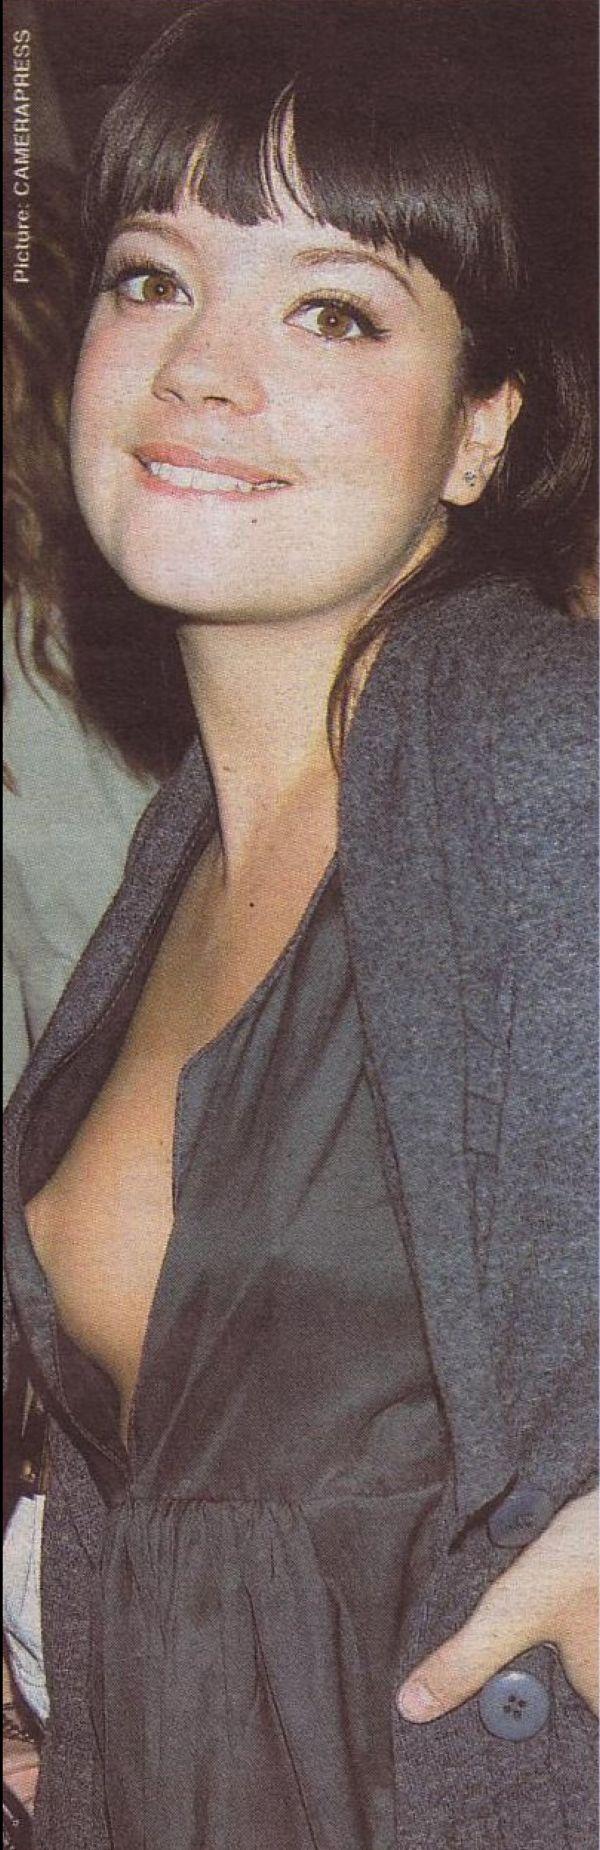 Lily Allen Nip Slip